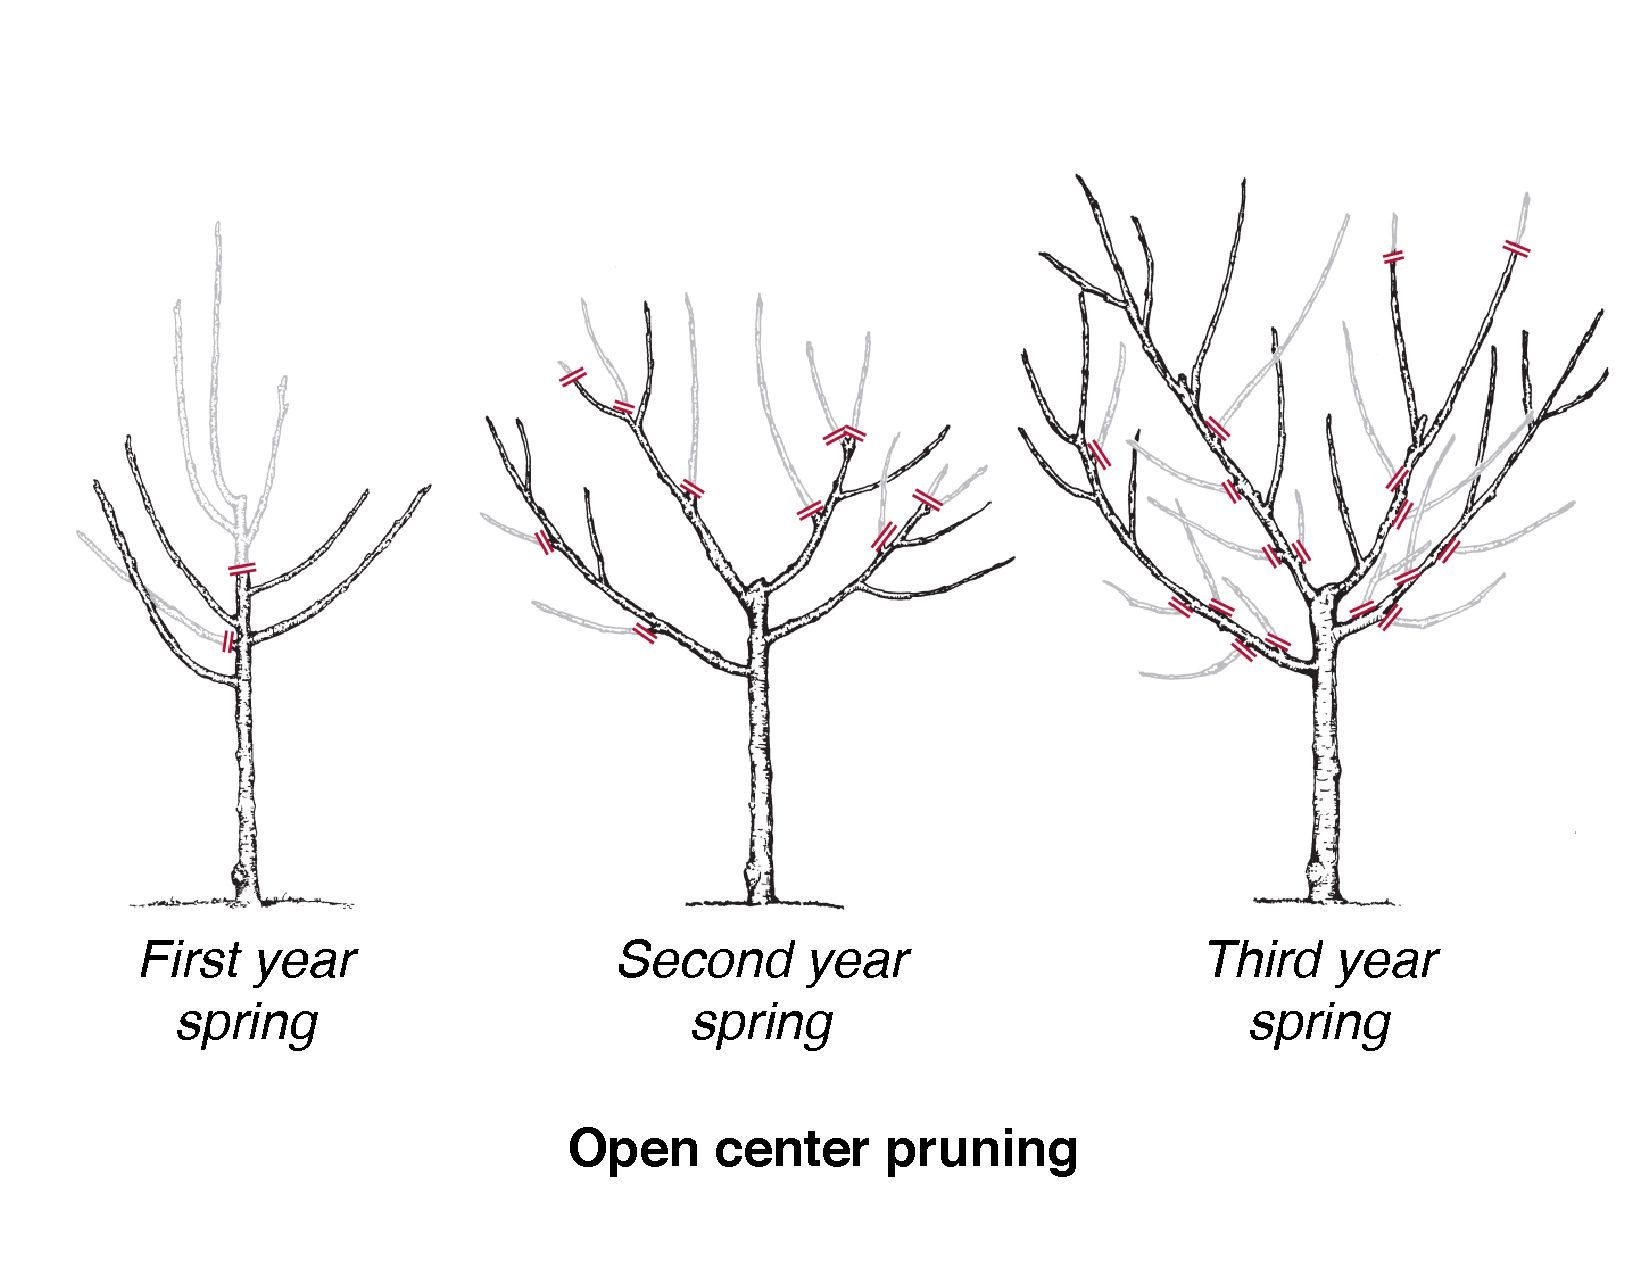 tree bush diagram wiring diagram forward tree bush diagram [ 1651 x 1275 Pixel ]